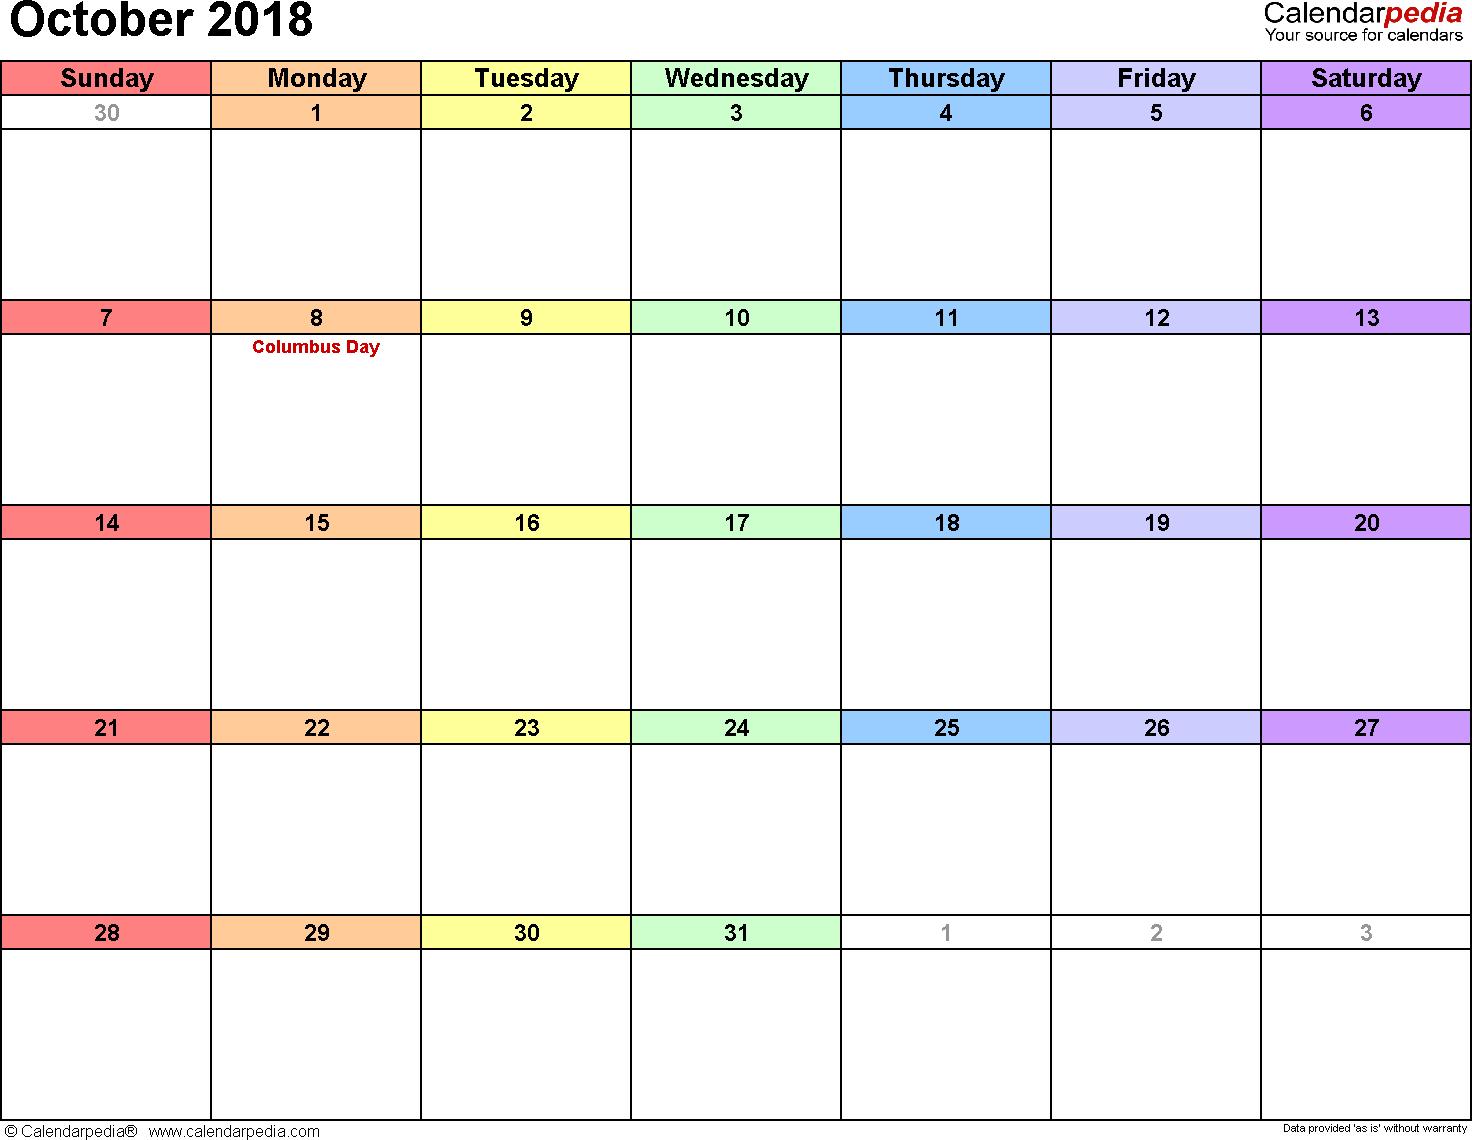 October 2018 Calendars For Word, Excel & Pdf regarding October Calendar Printable Template